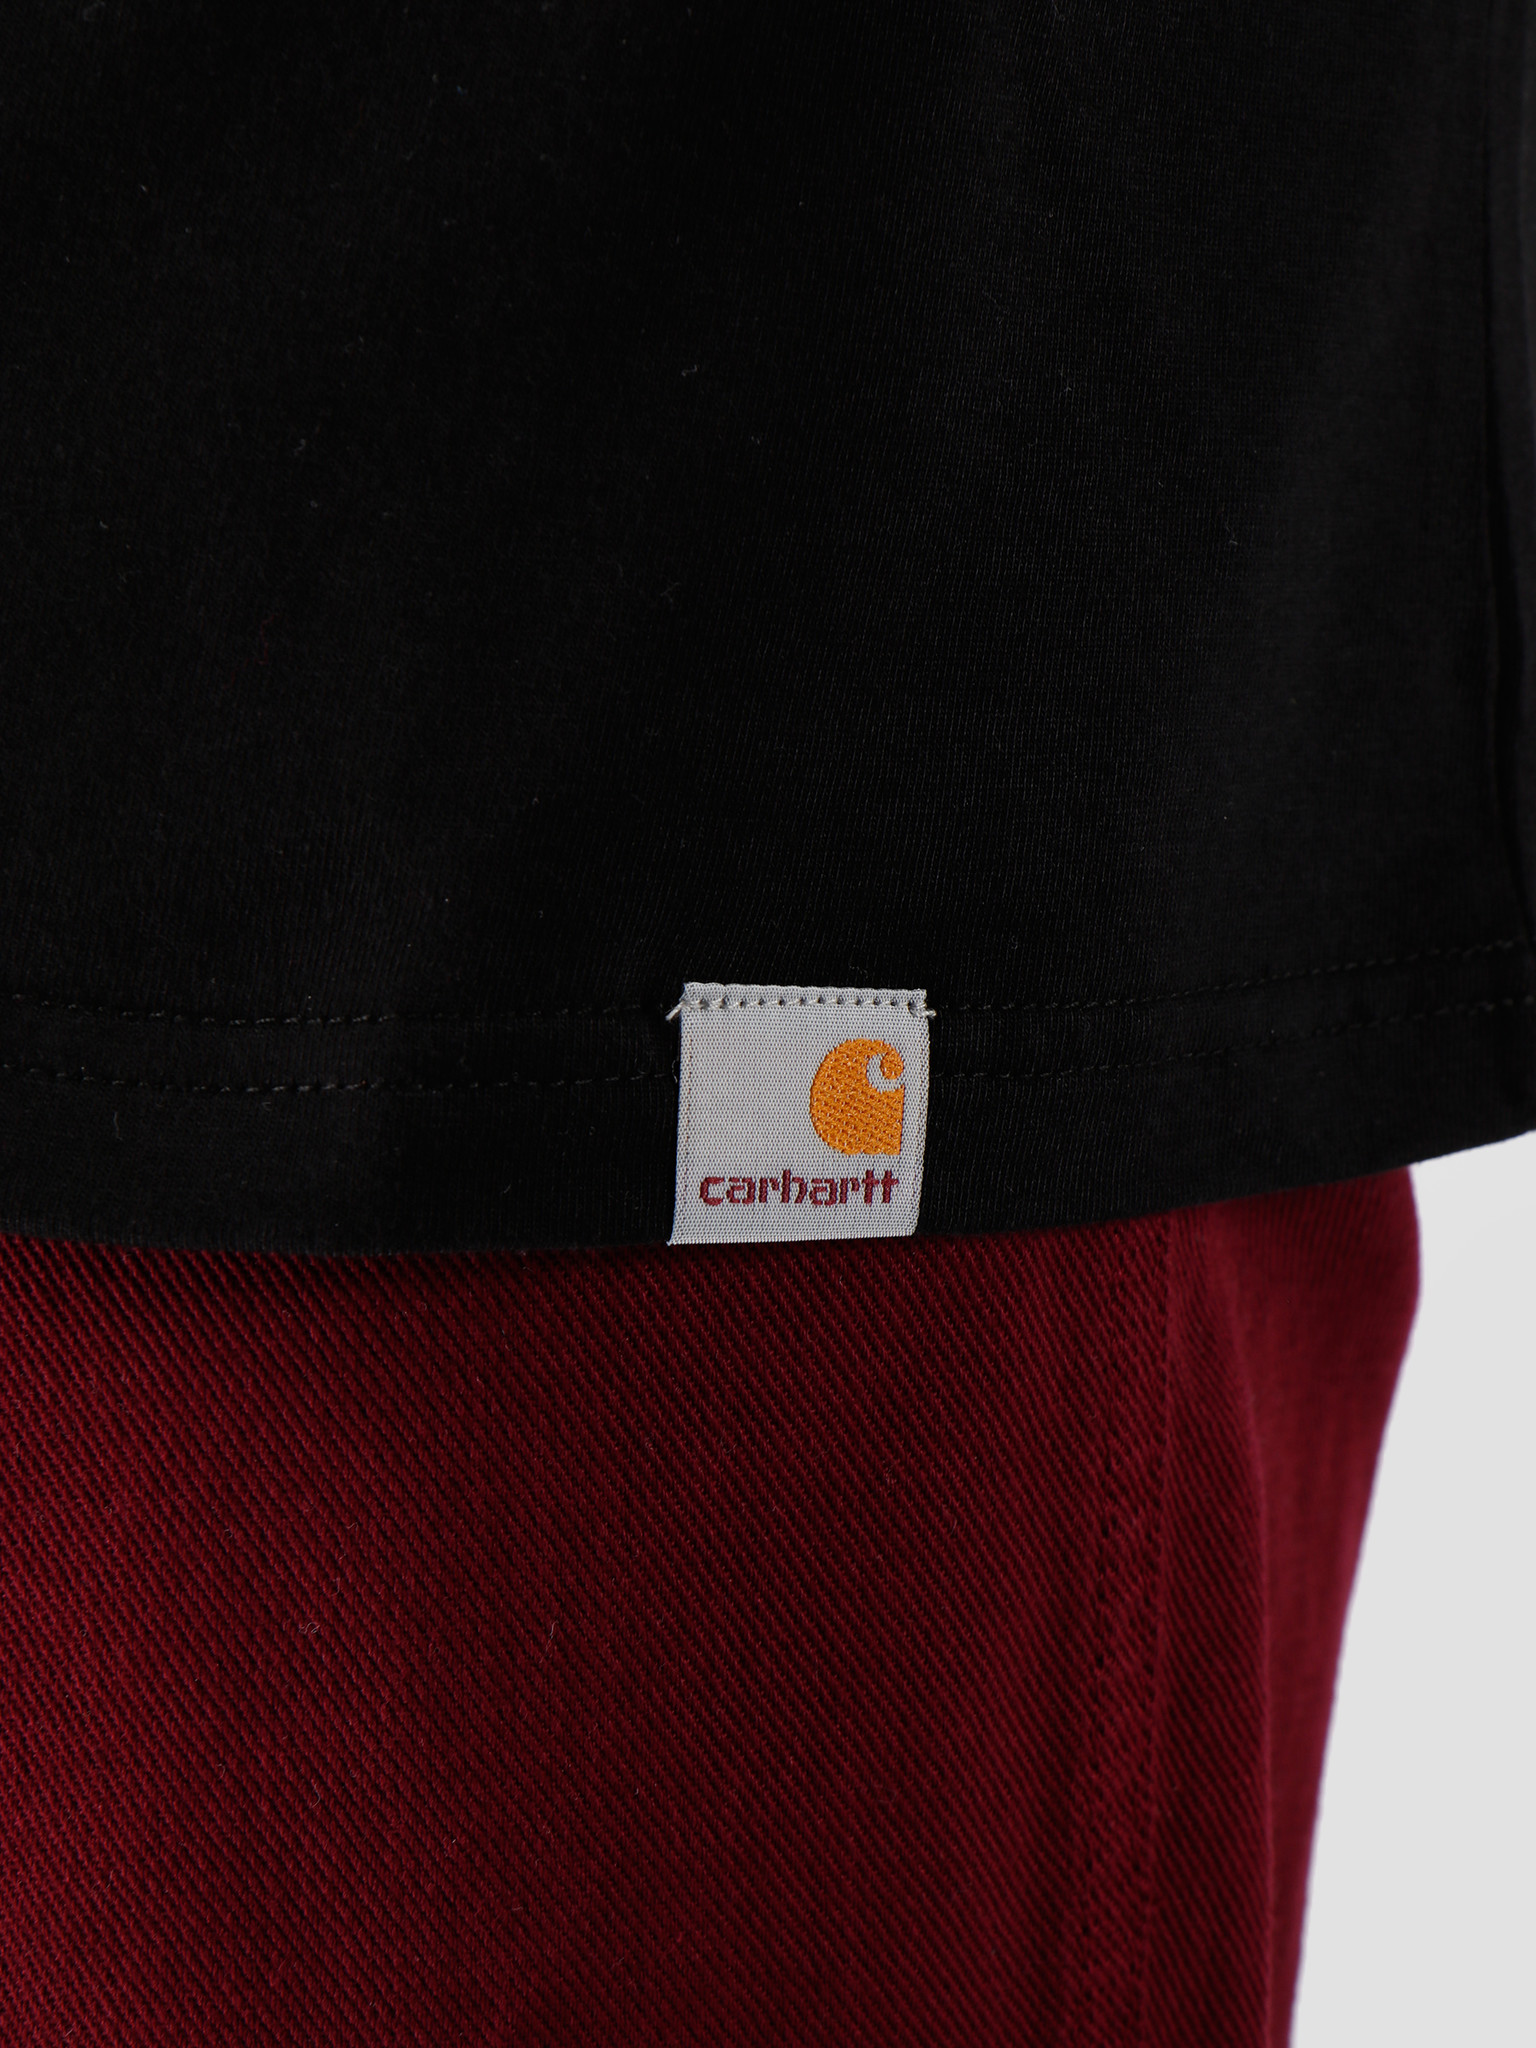 Carhartt WIP Carhartt WIP Matt Martin Blossom T S Black I027112